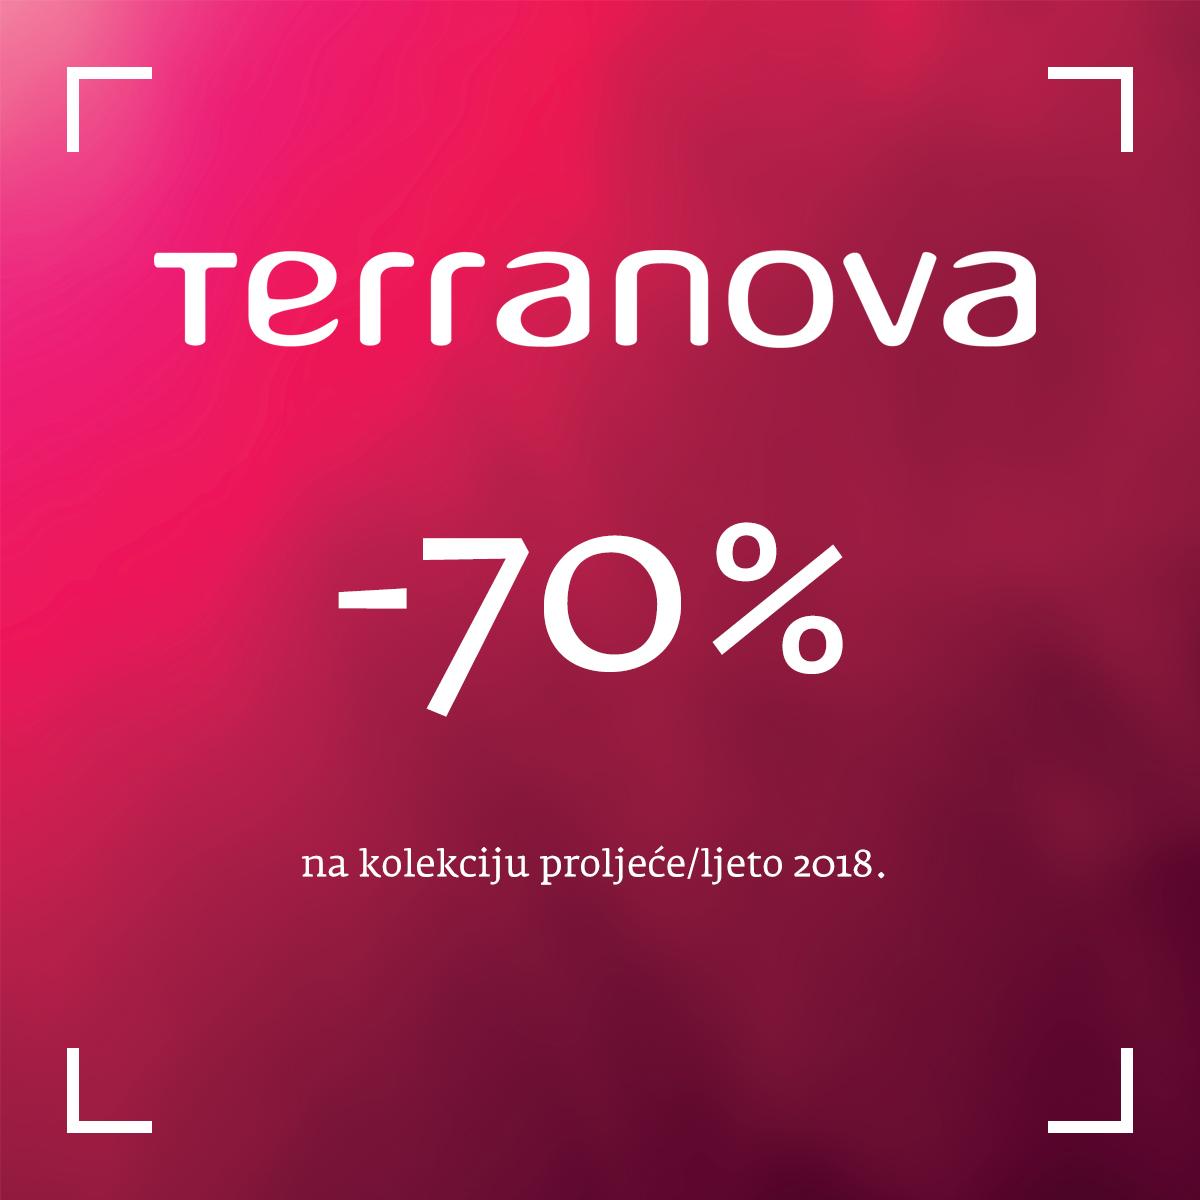 terranova inastagram 70